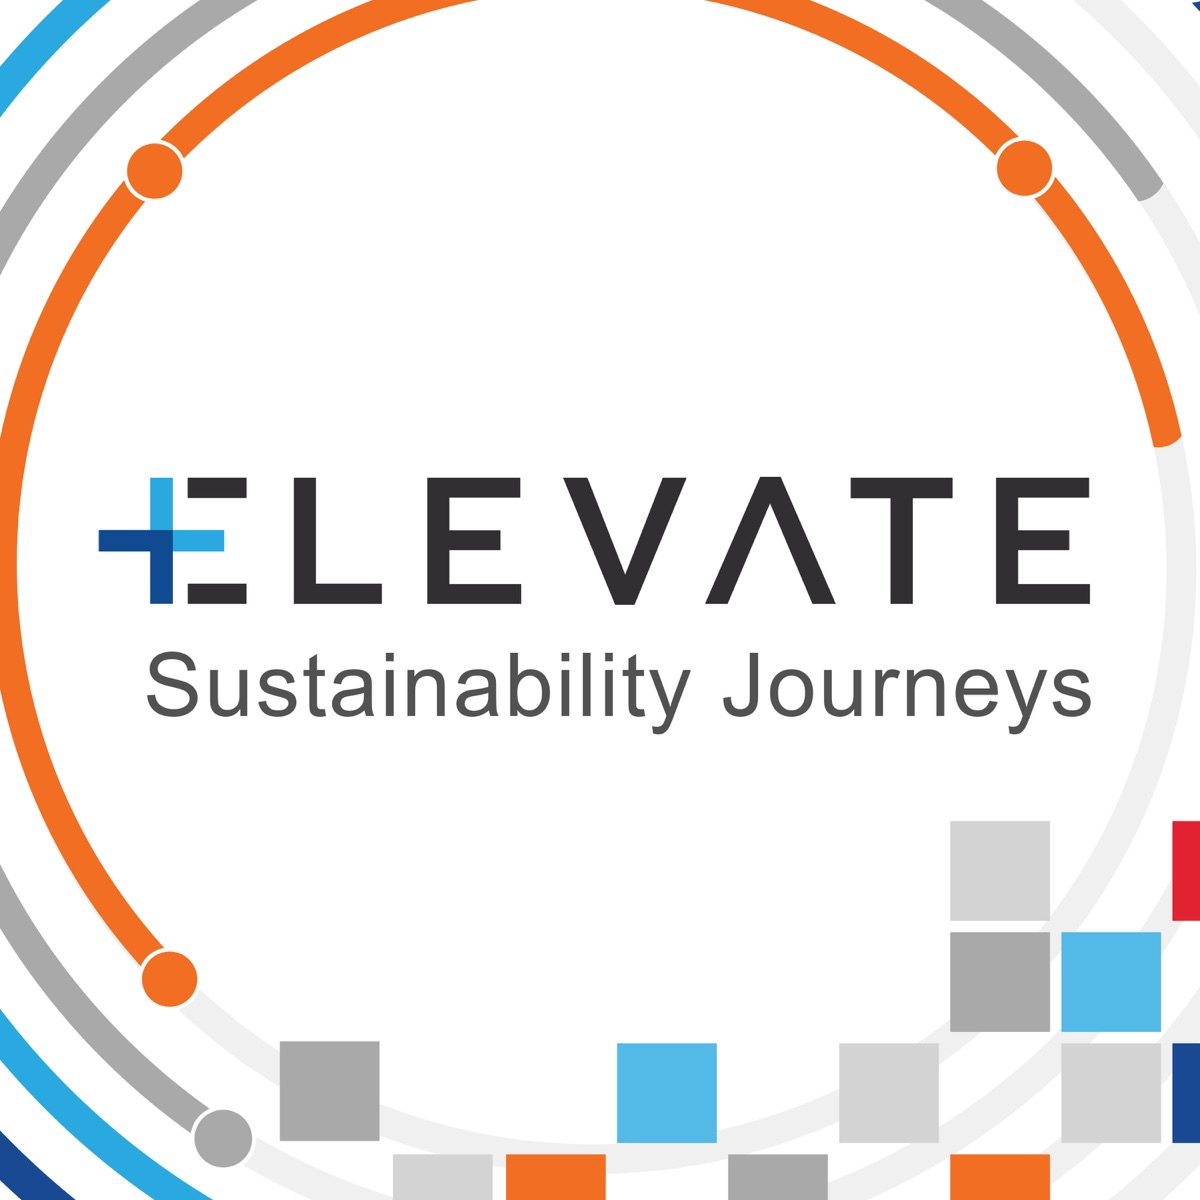 ELEVATE Sustainability Journeys